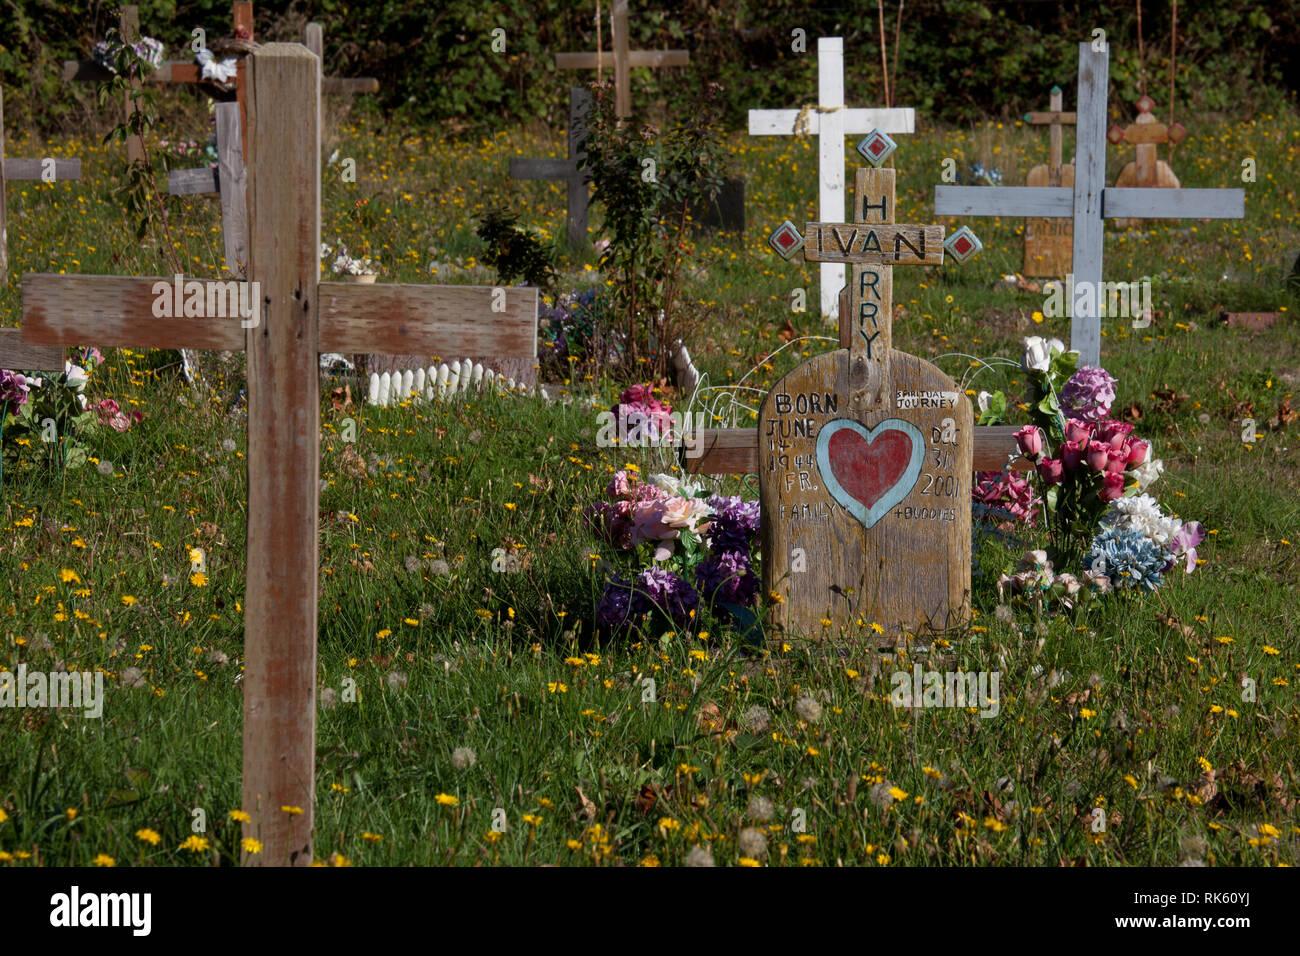 Sliammon, Sunshine Coast, British Columbia, Canada - Stock Image